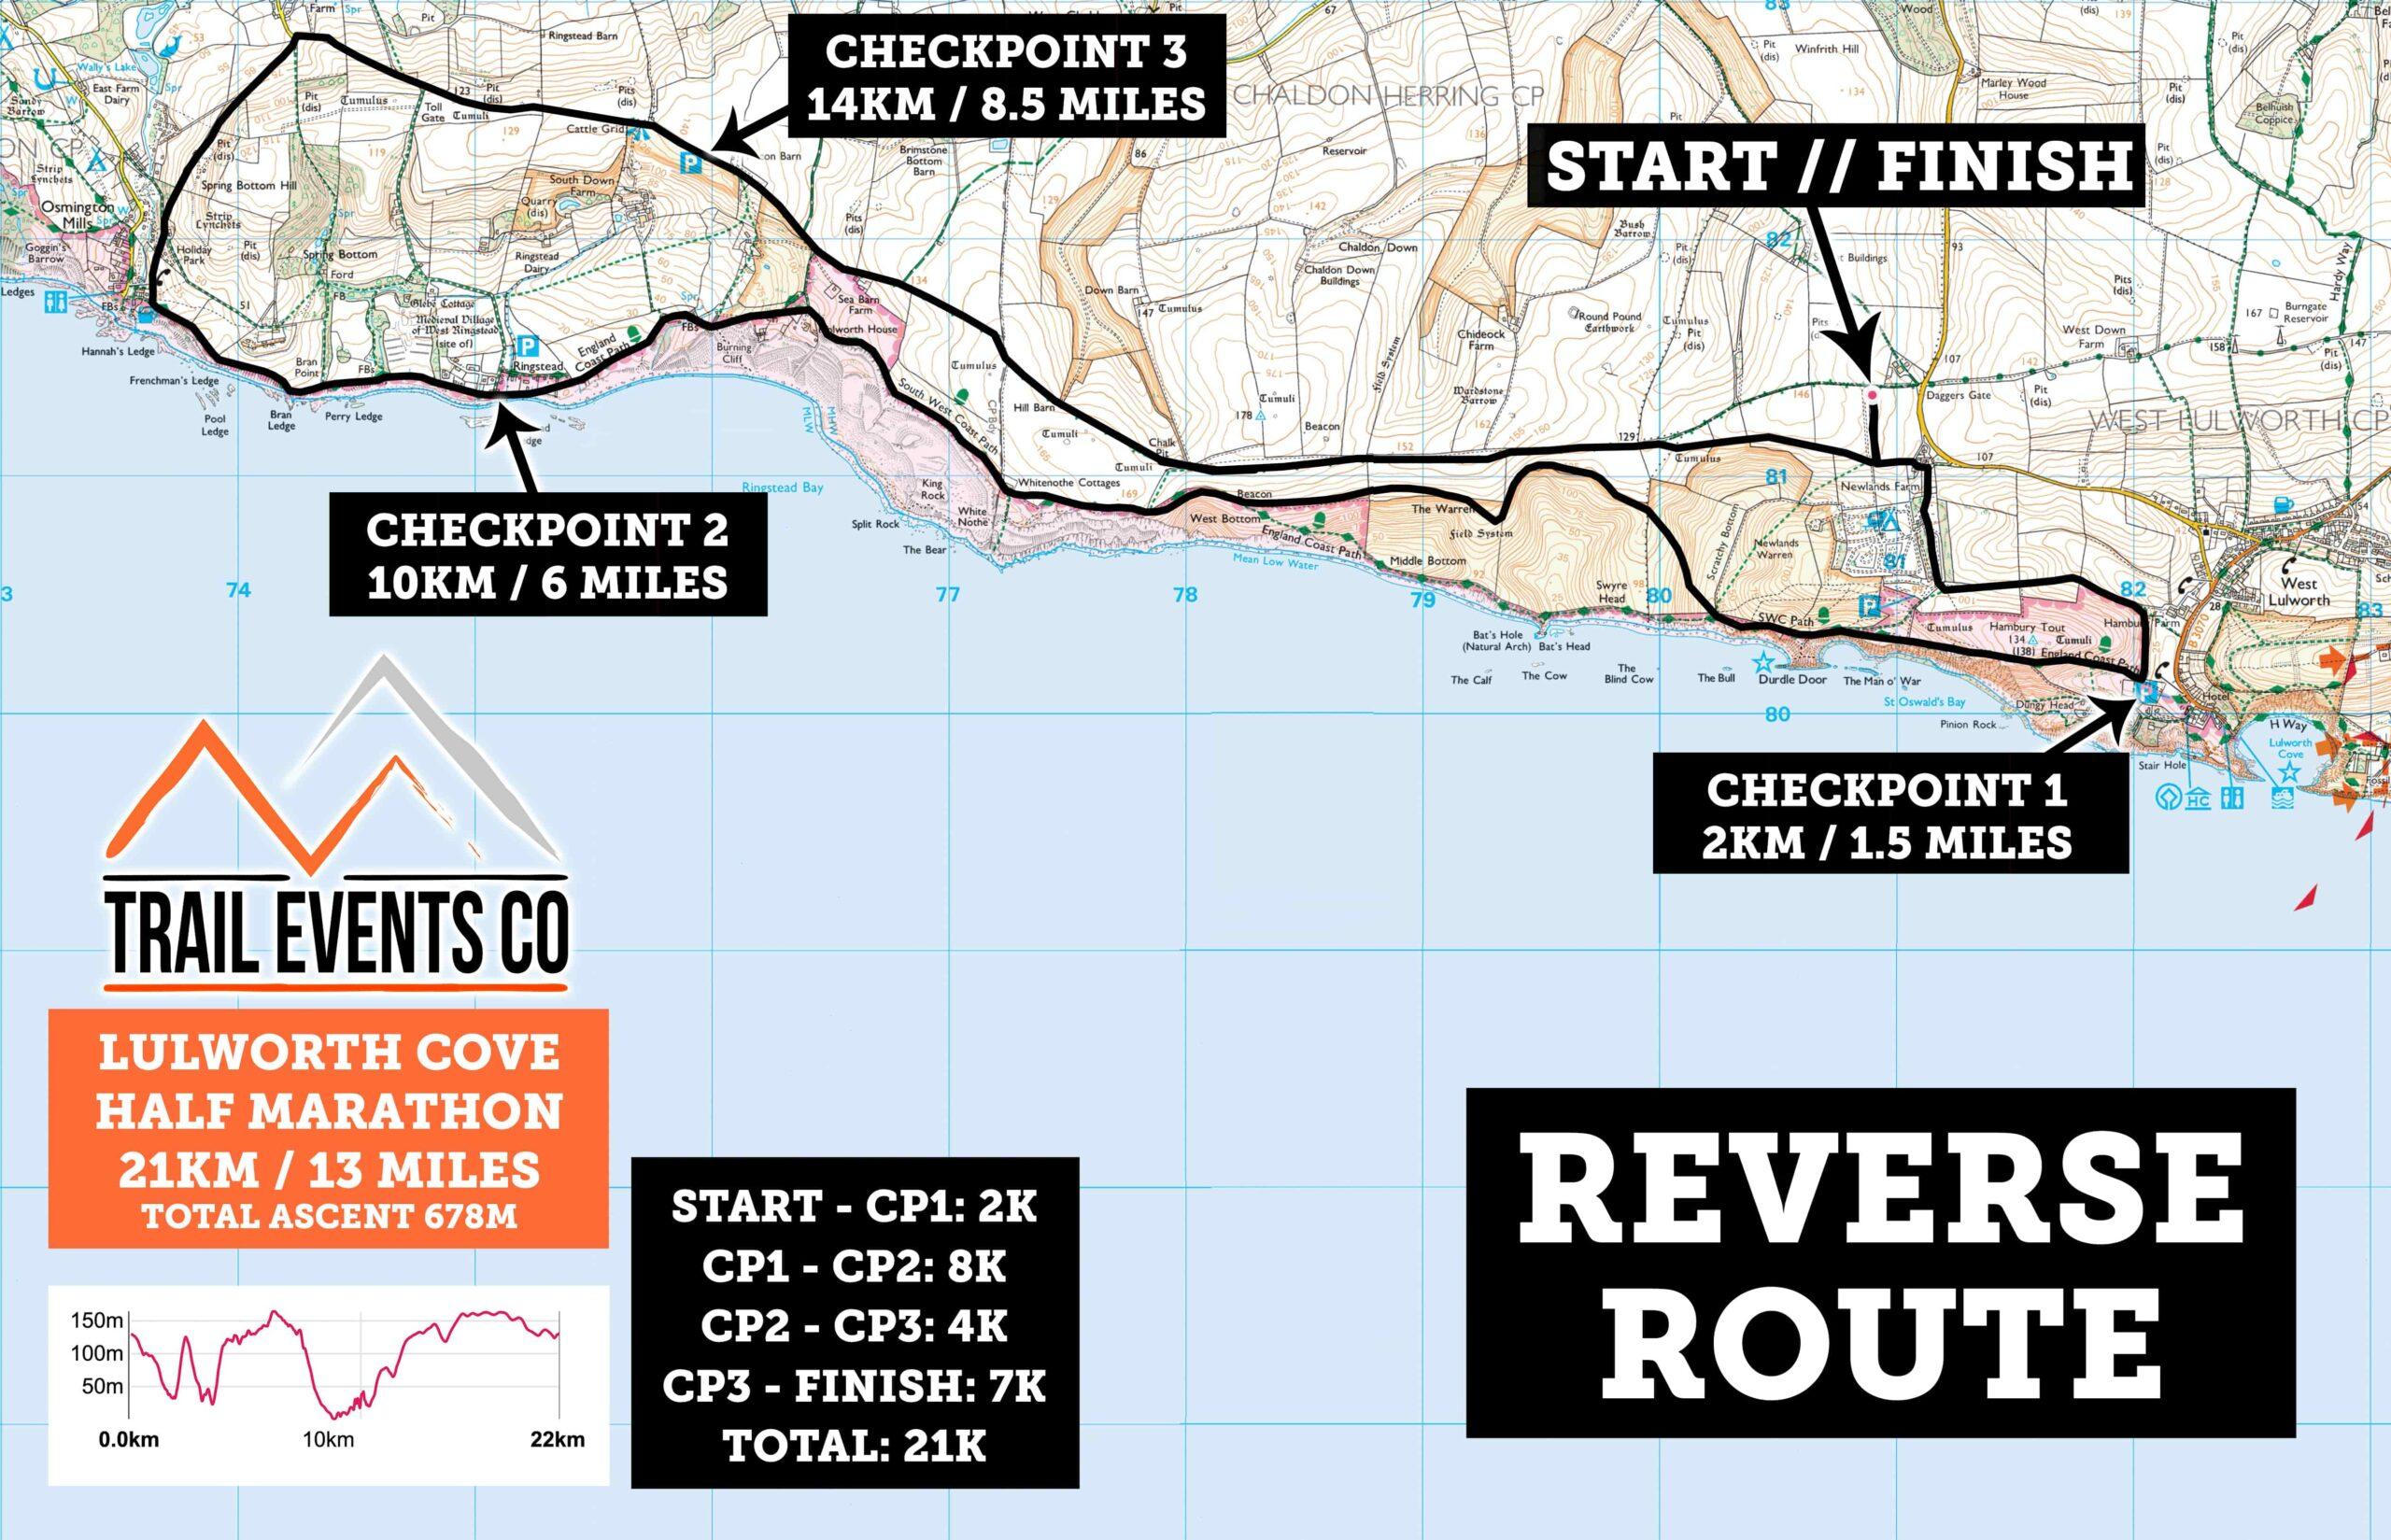 Lulworth Cove Half Marathon Reverse